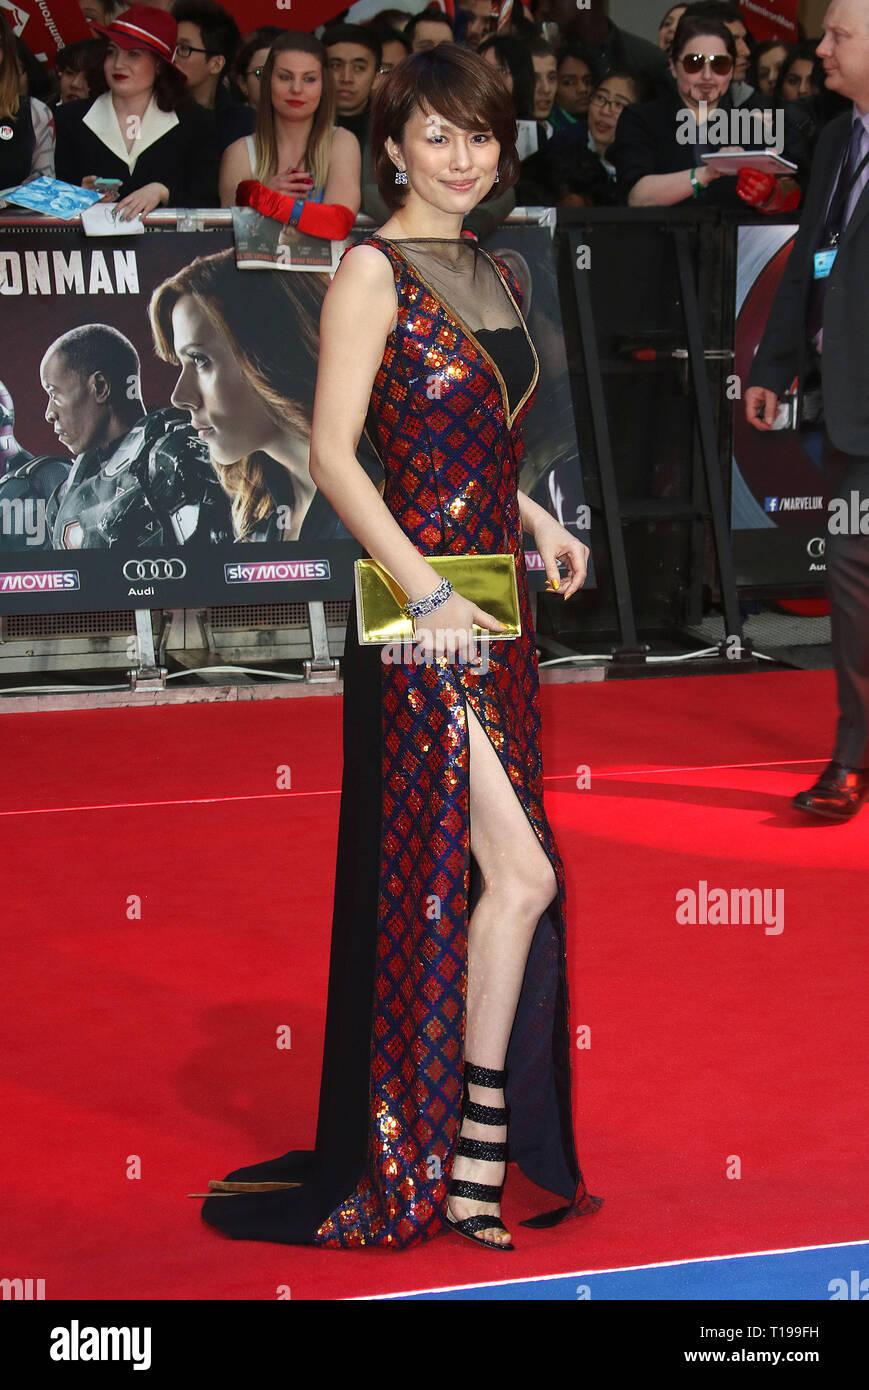 Apr 26, 2016 - London, England, UK - Captain America: Civil War European Film Premiere, Vue Westfield - Red Carpet Arrivals Photo Shows: Ryoko Yonekur - Stock Image